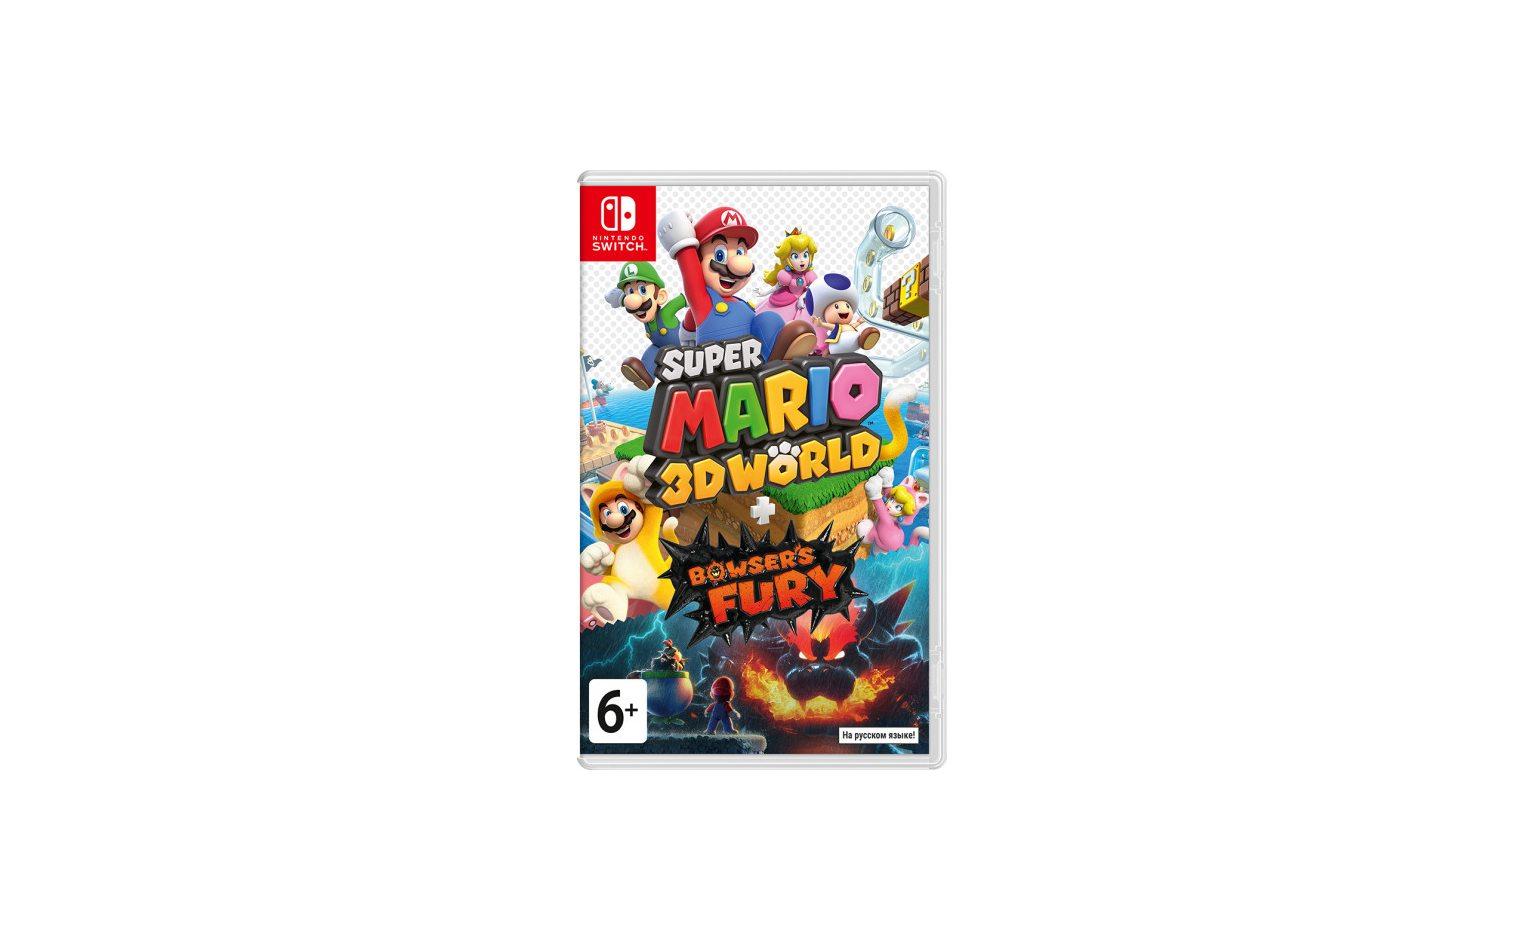 Nintendo Super Mario 3D World Bowser's Fury Nintendo